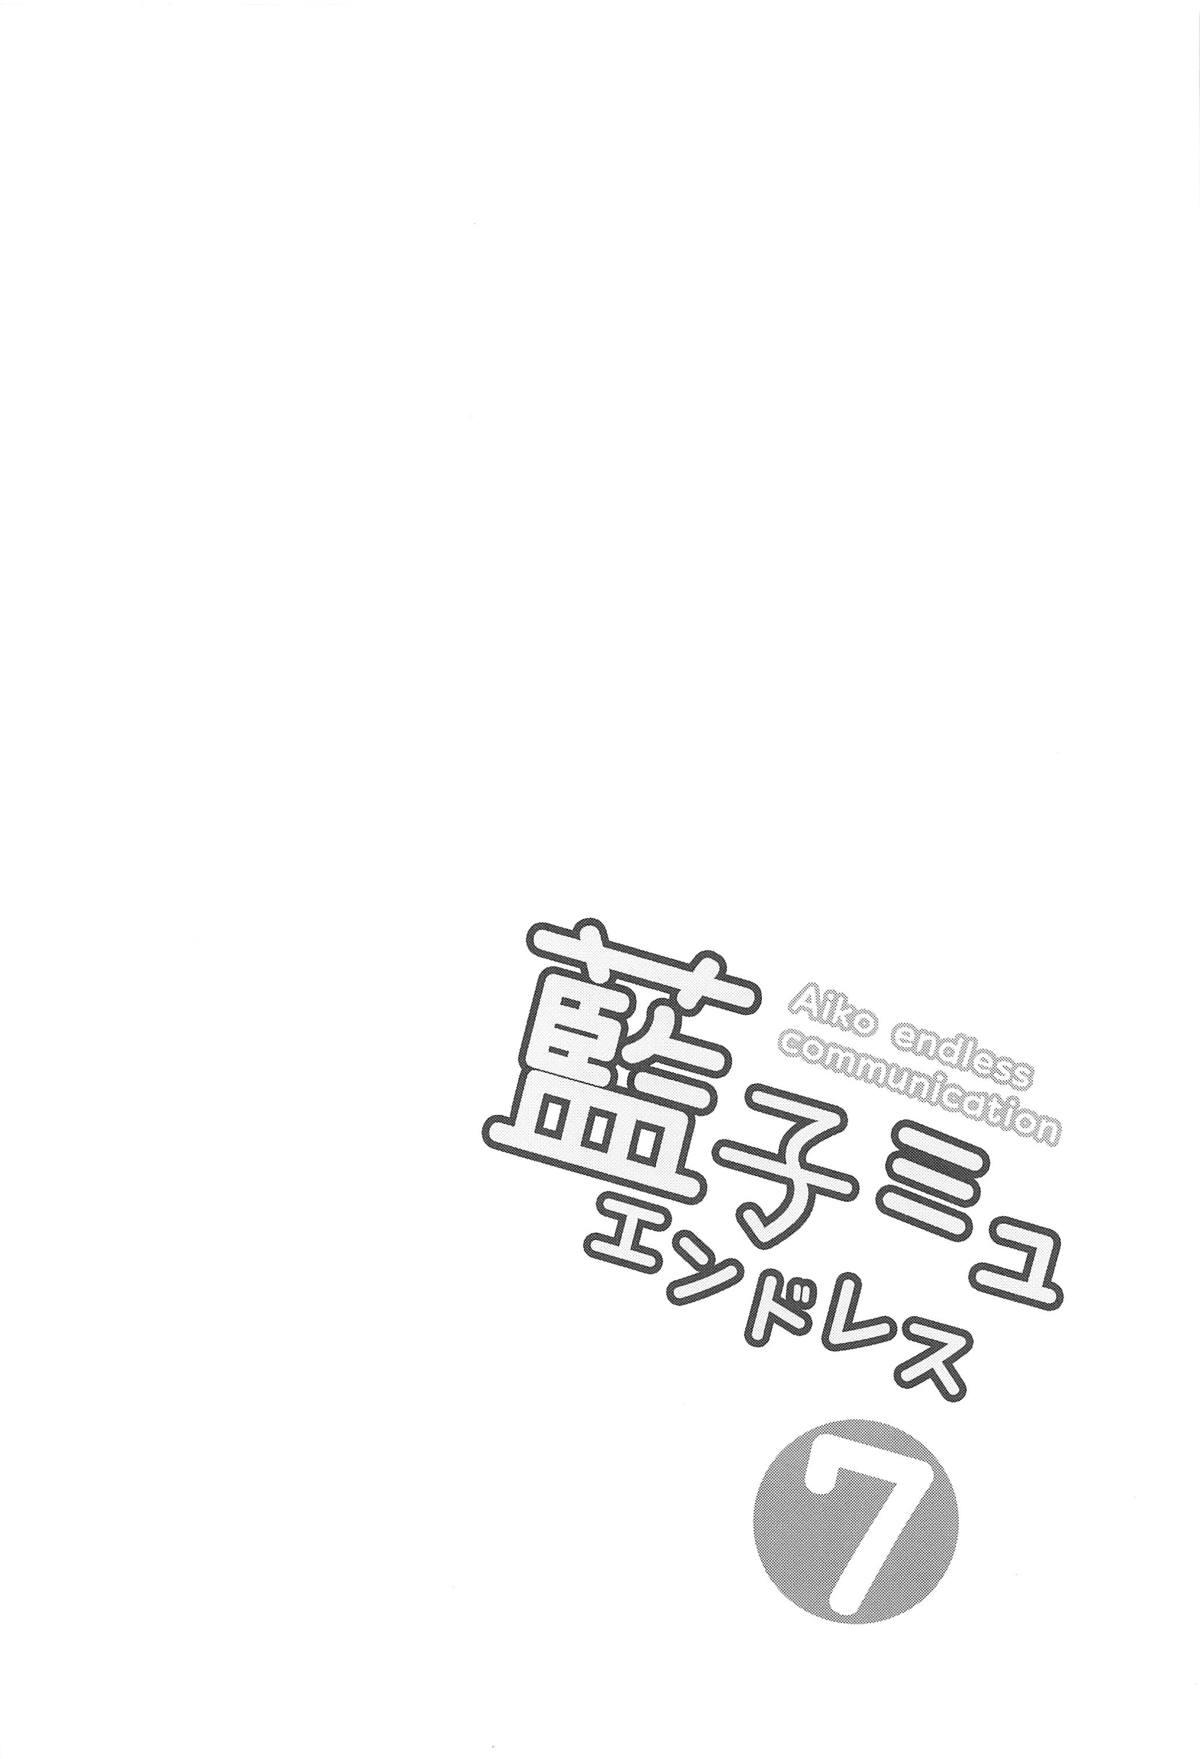 Aiko Myu Endless 7 2